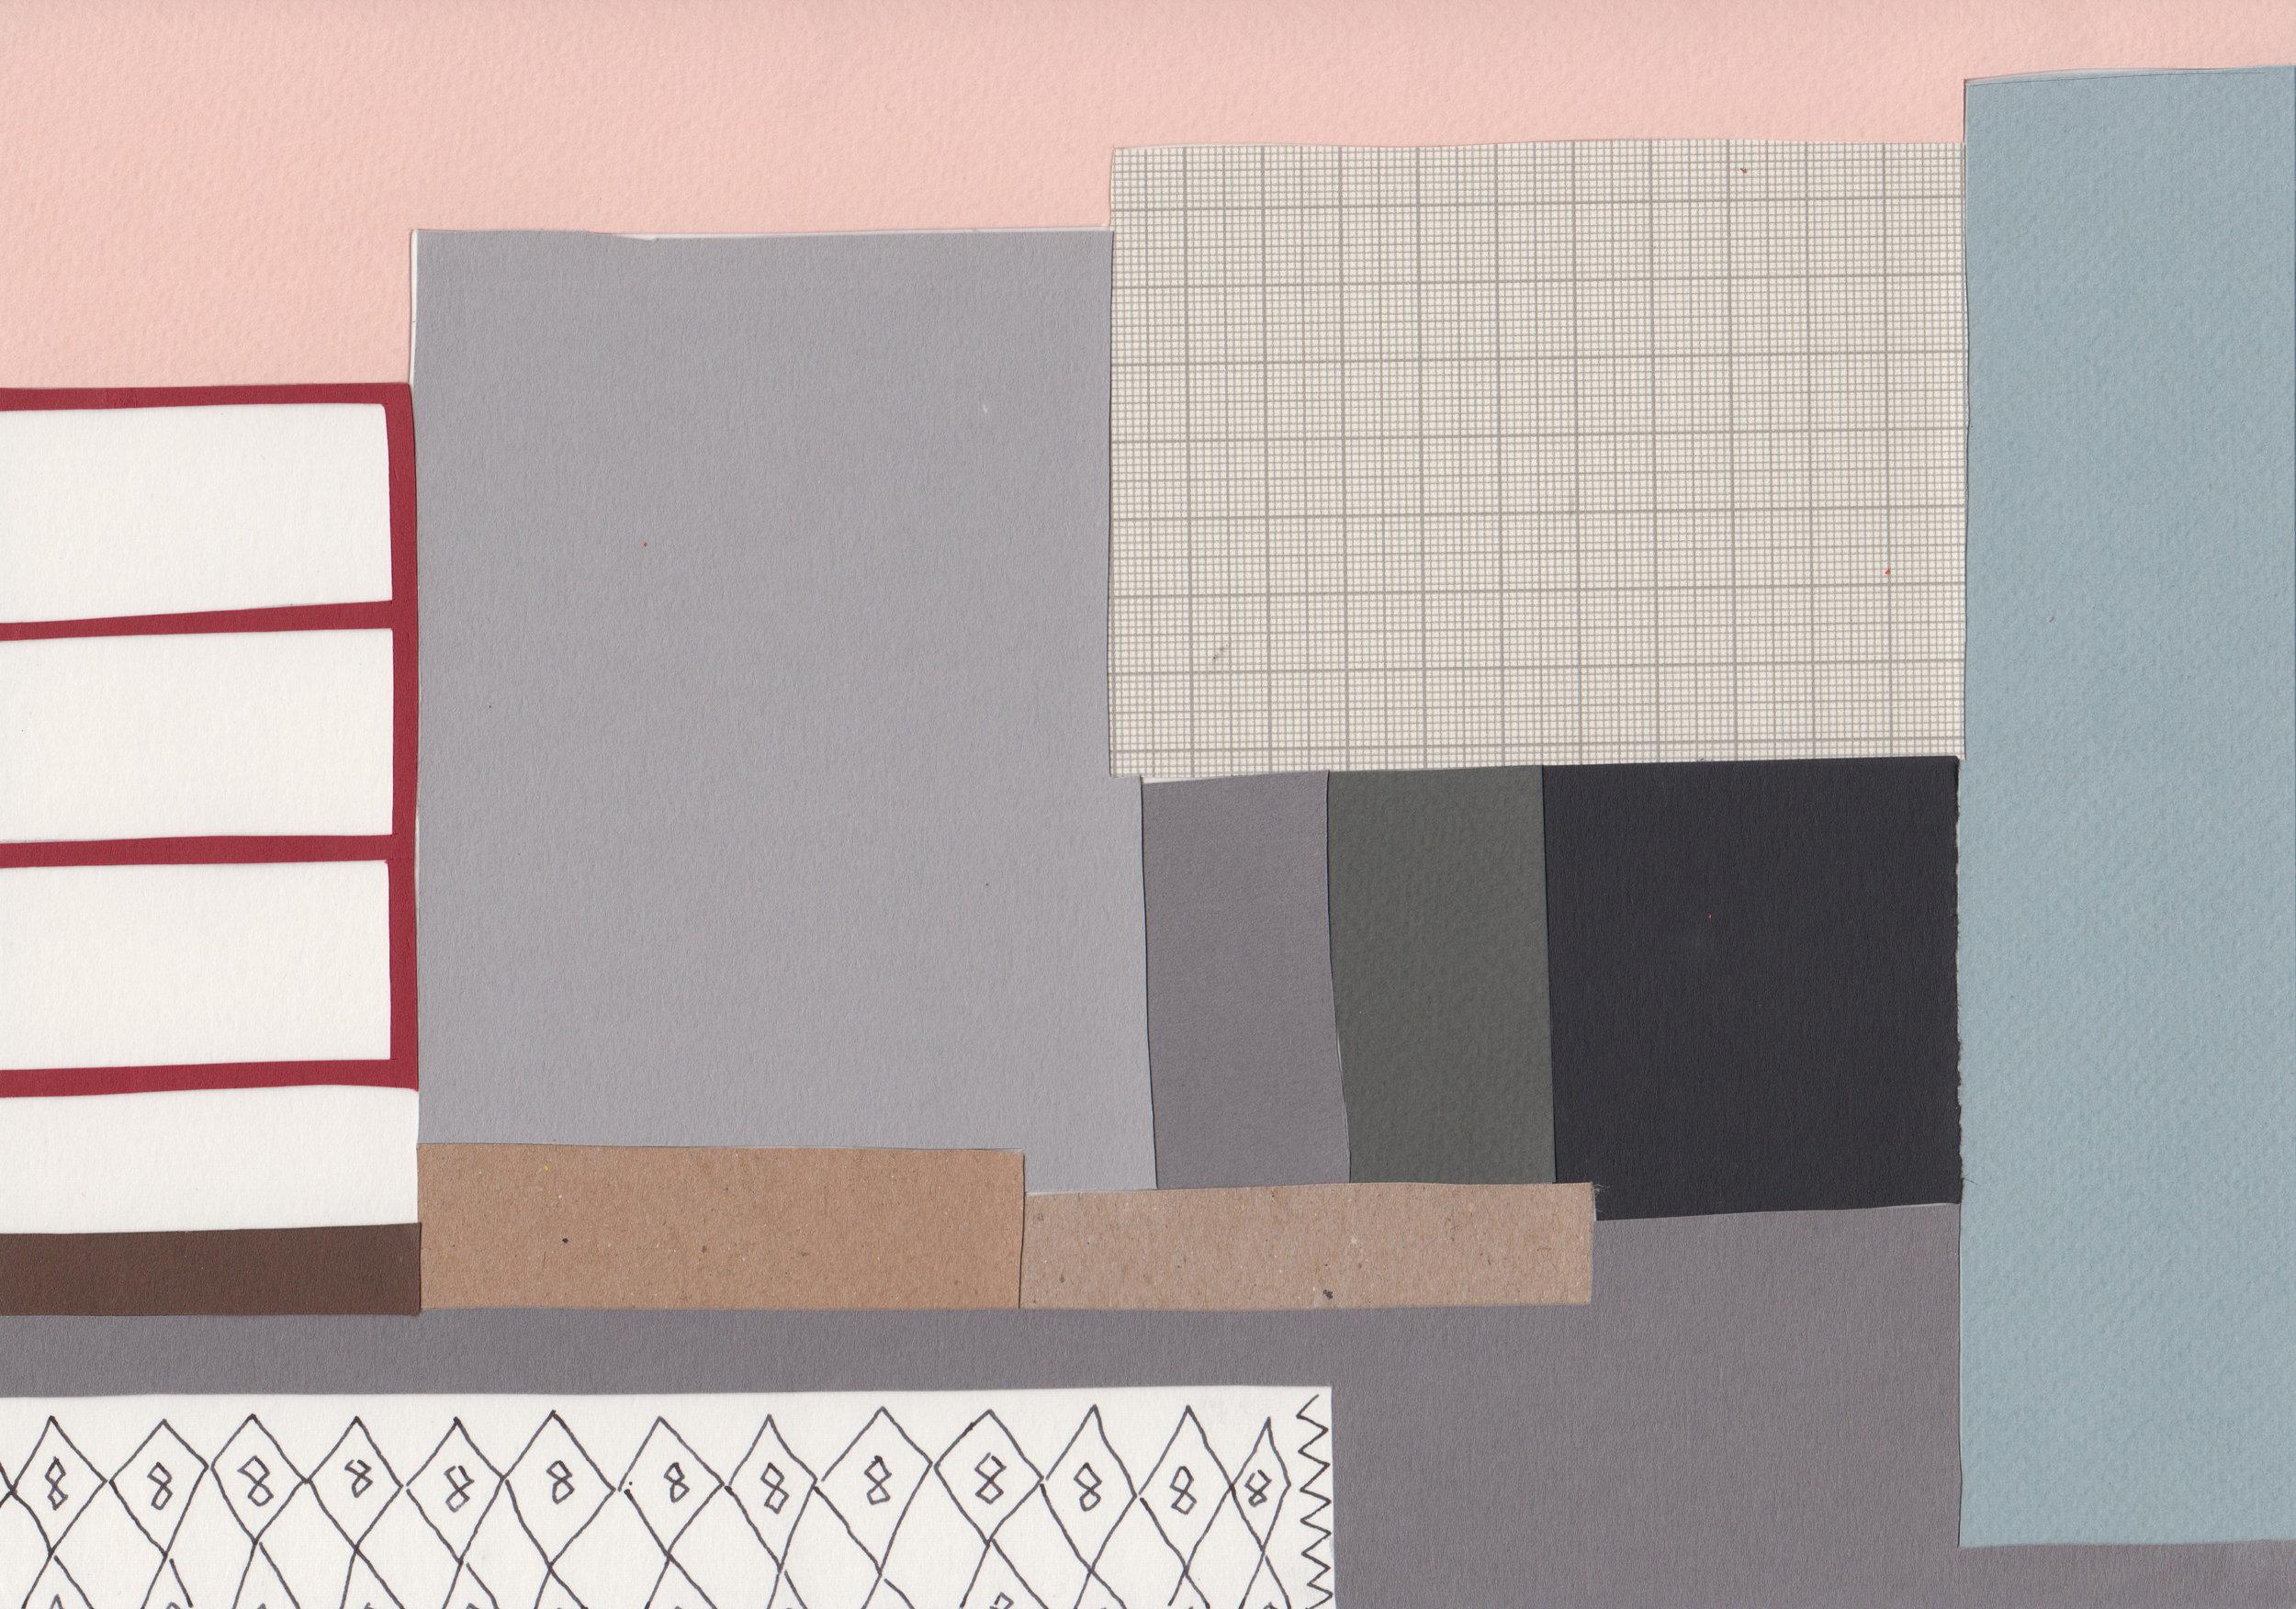 Eleanor_Pritchard_Fallingwater_hearth_window_frames_collage_1.jpg